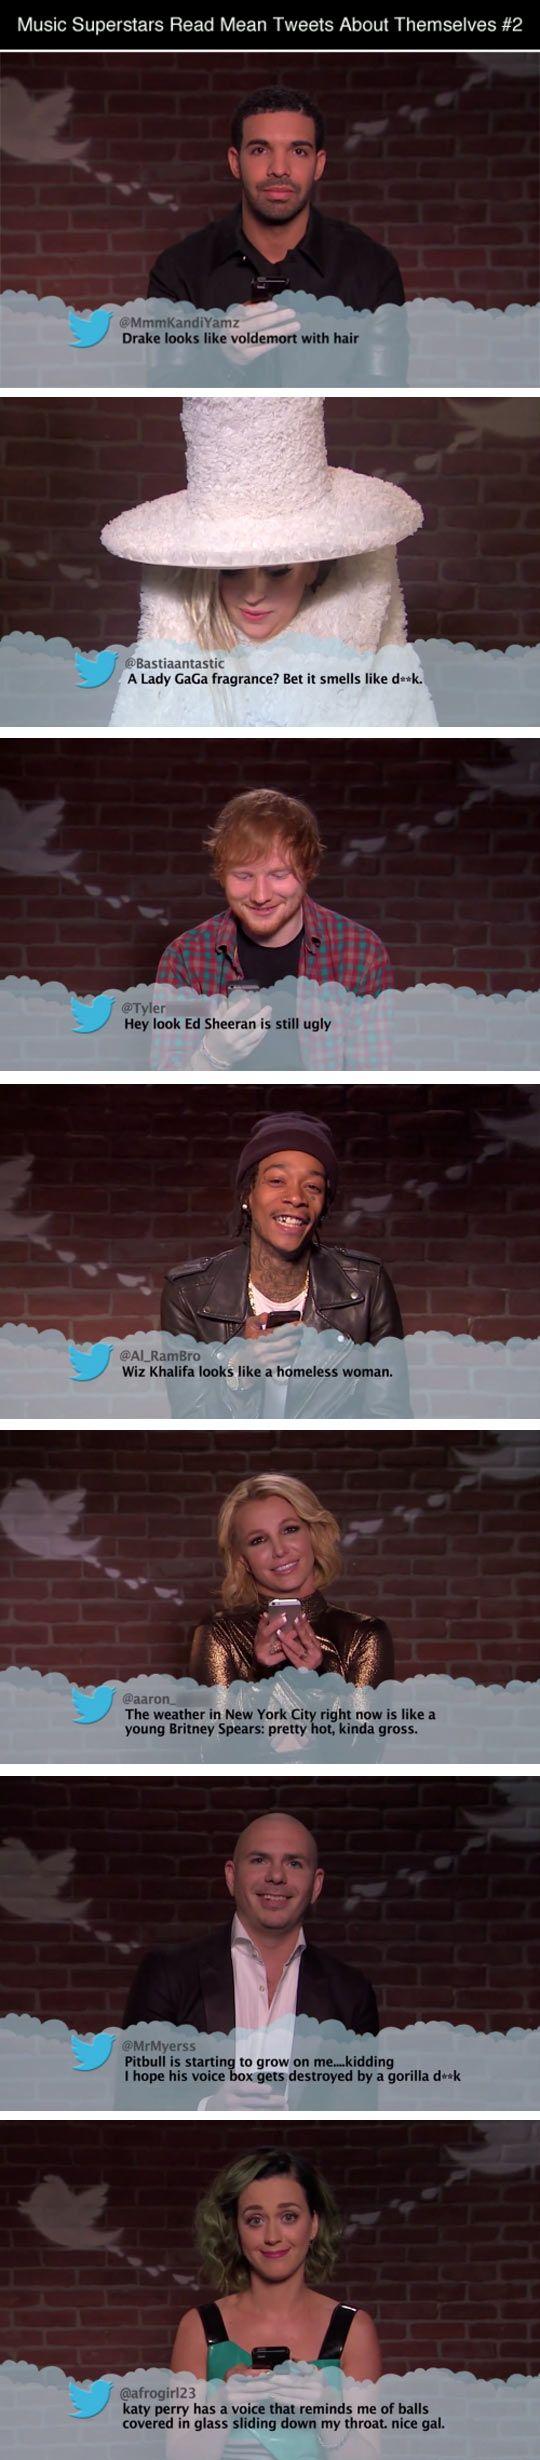 Meet the 20 Funniest Celebrities on Twitter - ThoughtCo